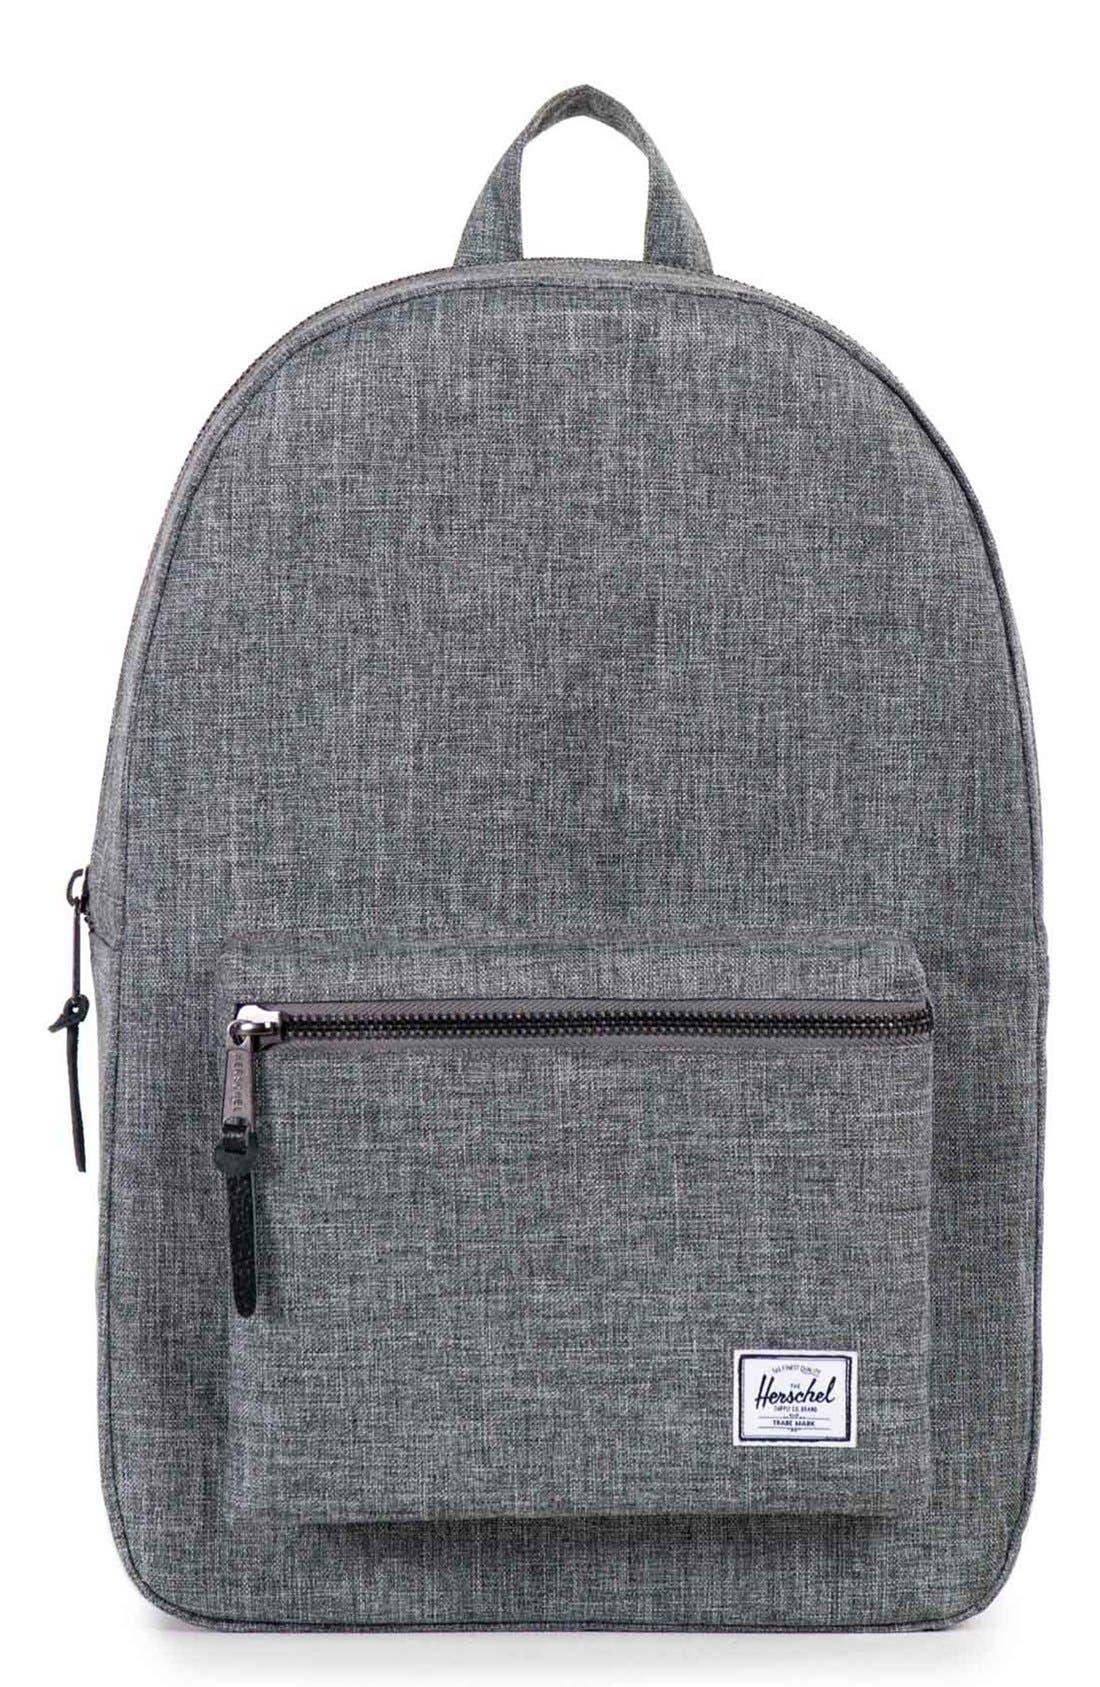 1b5df720d3 UPC 828432082407 - Herschel Supply Co. Settlement Backpack, Raven ...